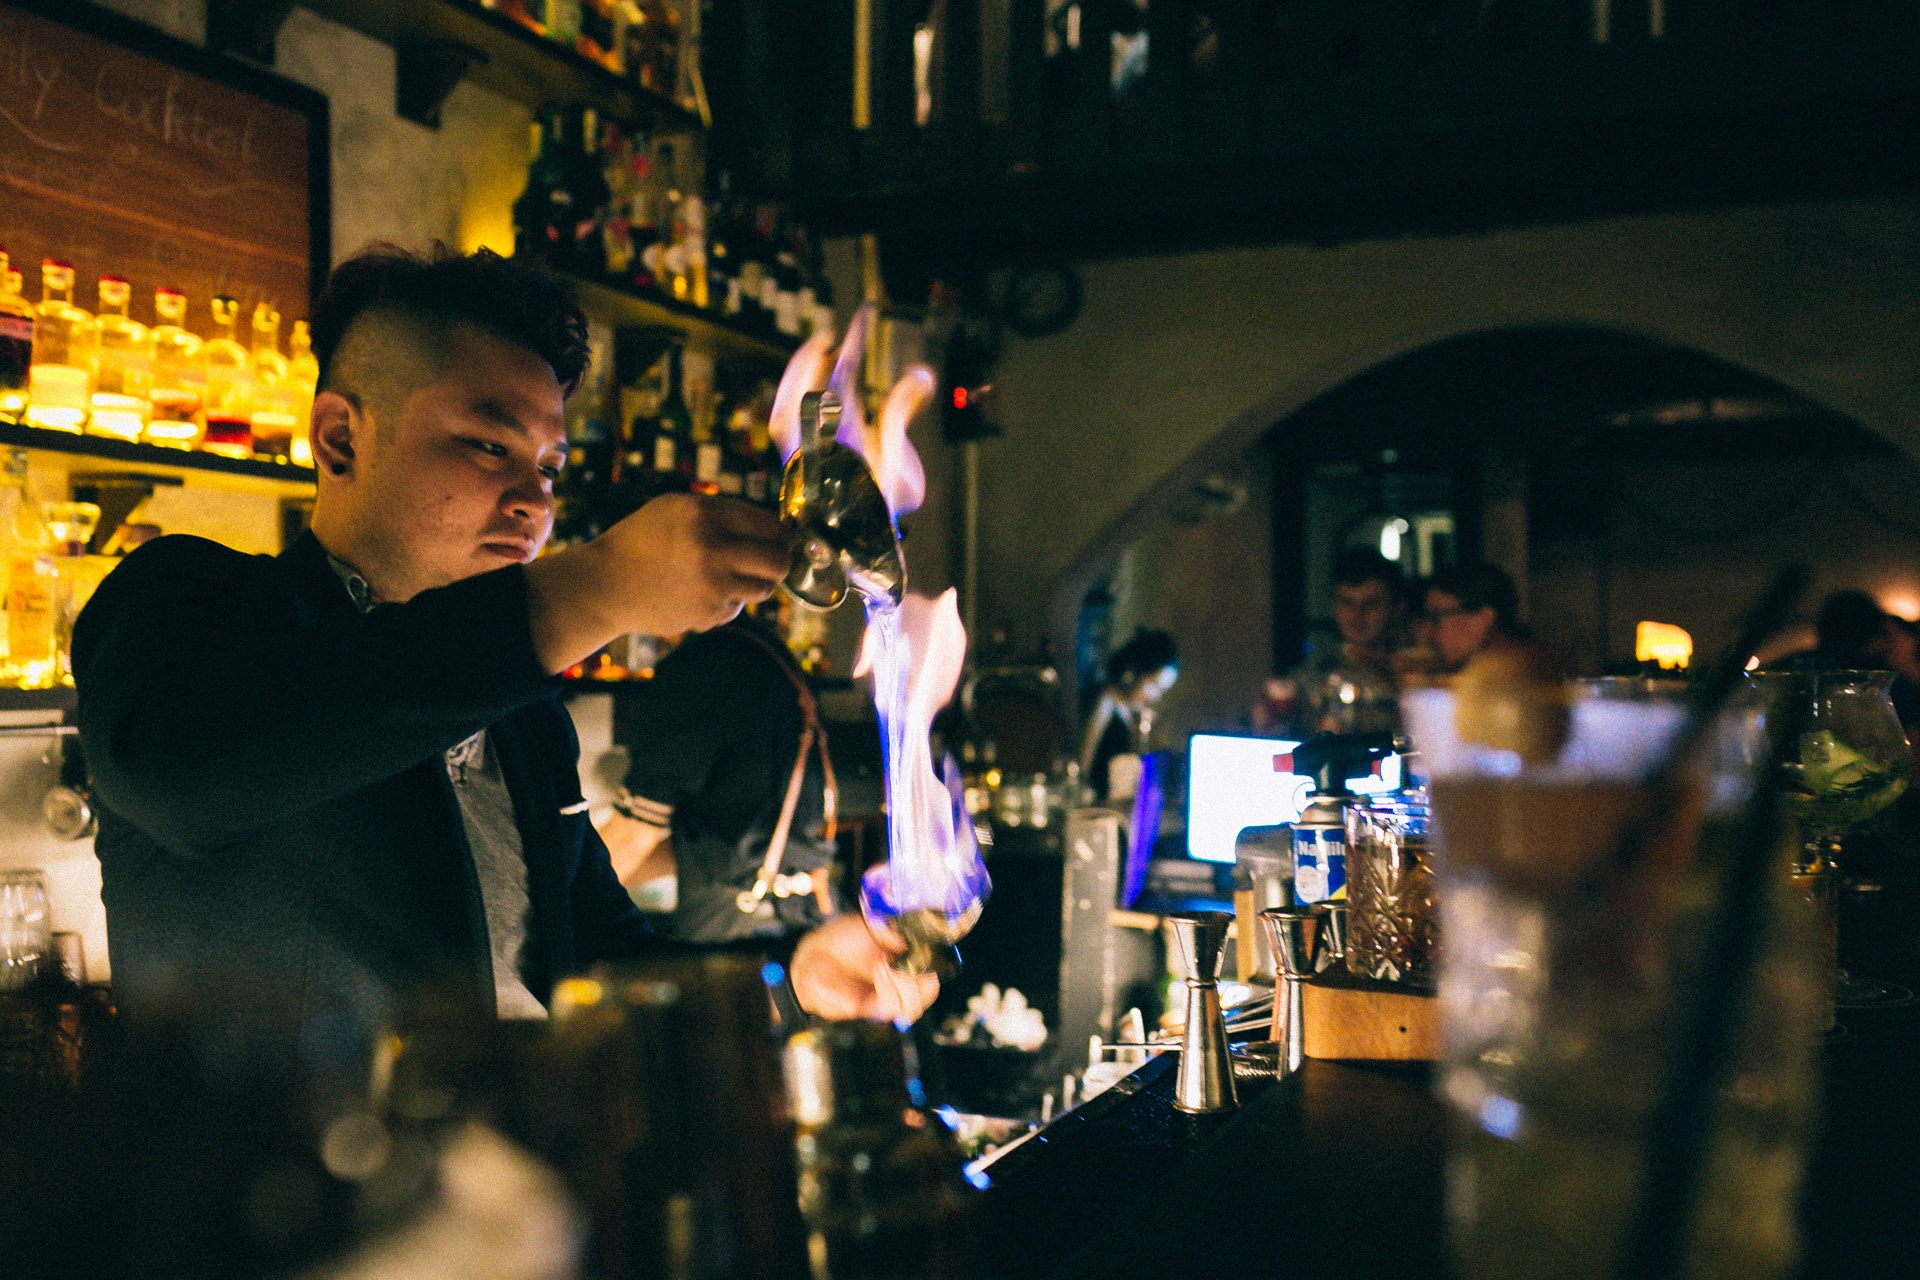 Mot dem cua anh chang bartender Sai Gon hinh anh 25